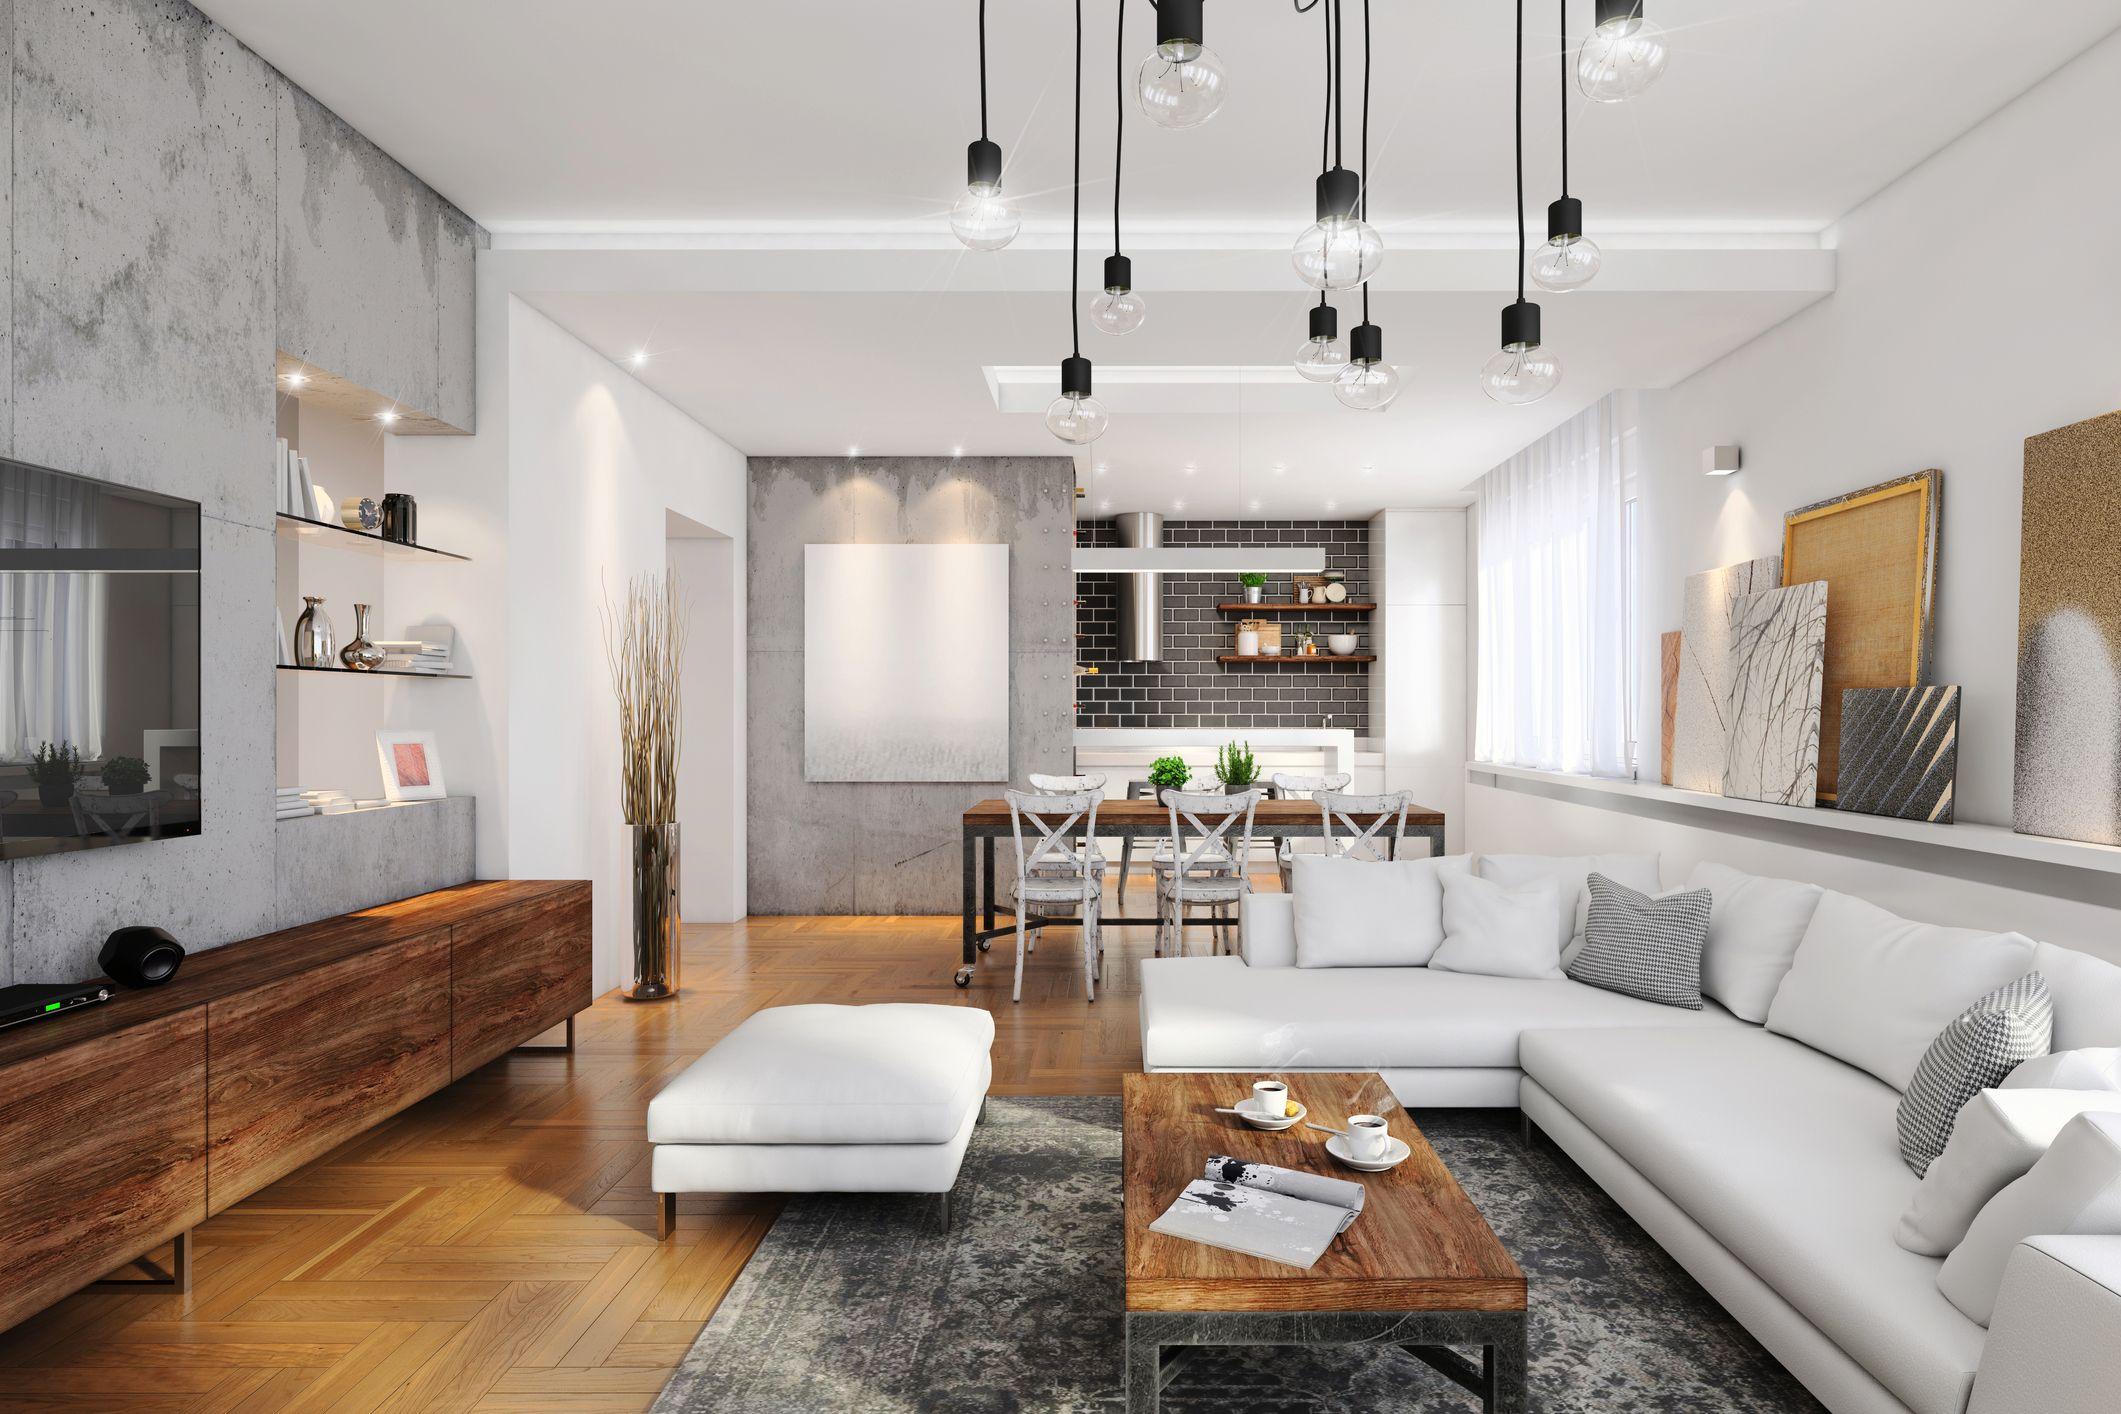 4 Stylish Ways to Modernize Your Home